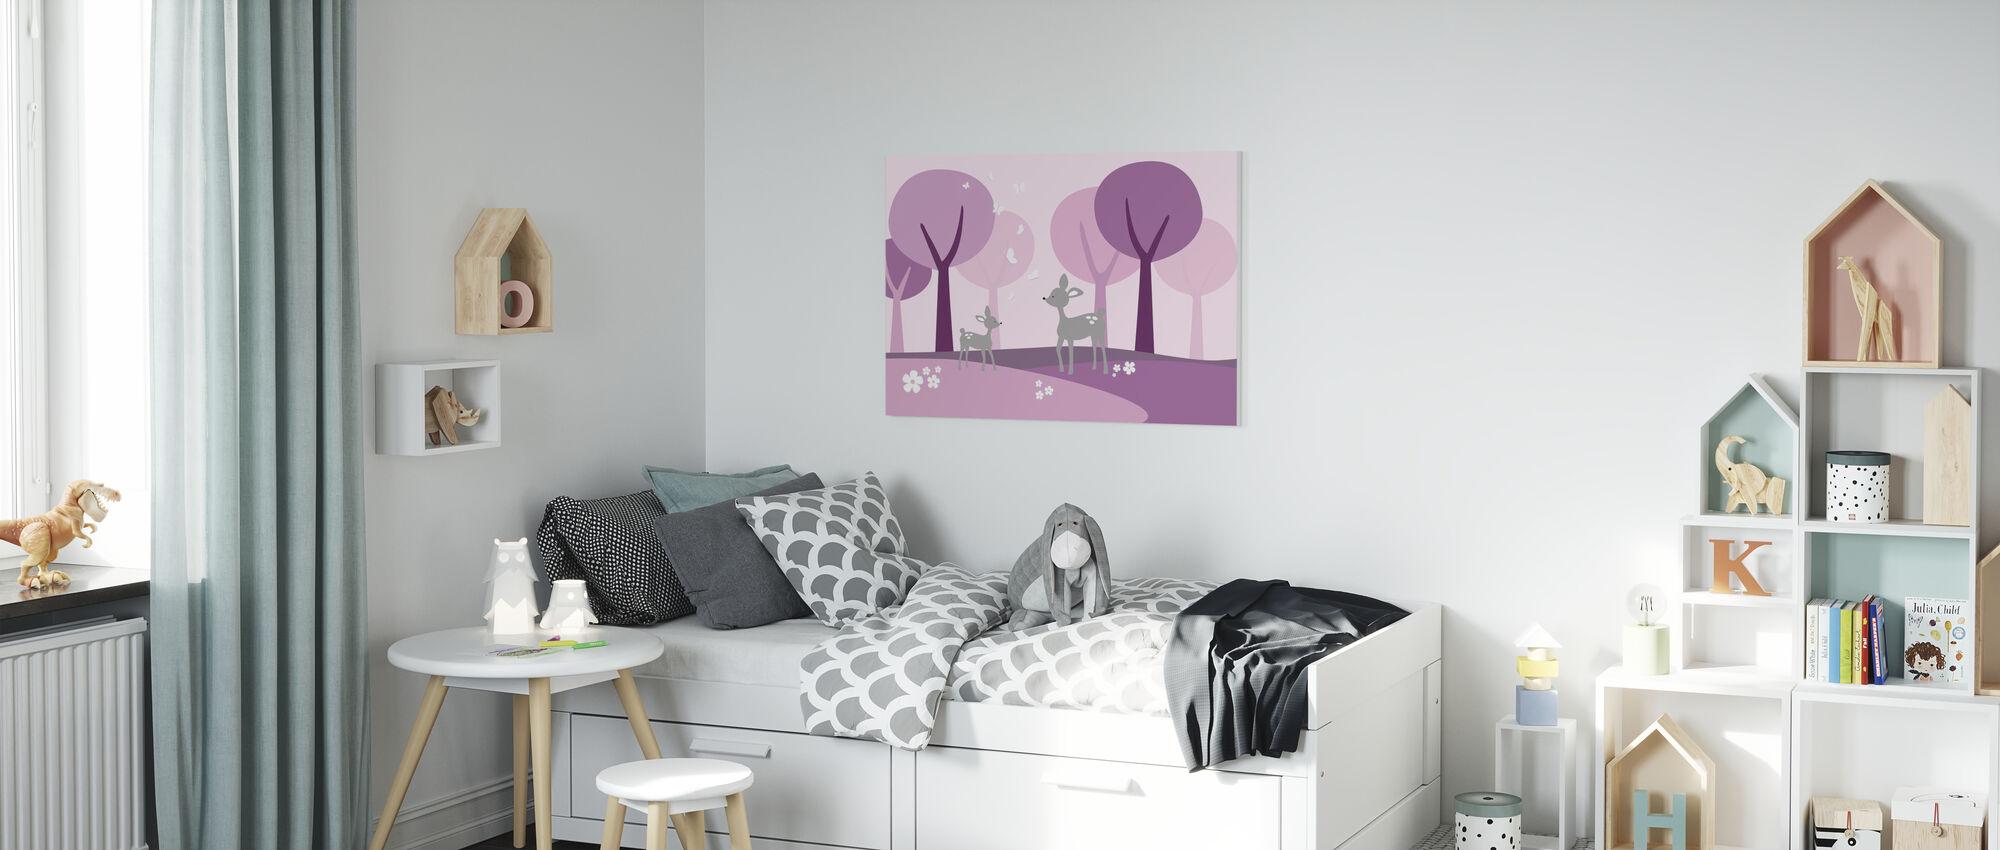 Herten in het bos - Paarse - Canvas print - Kinderkamer